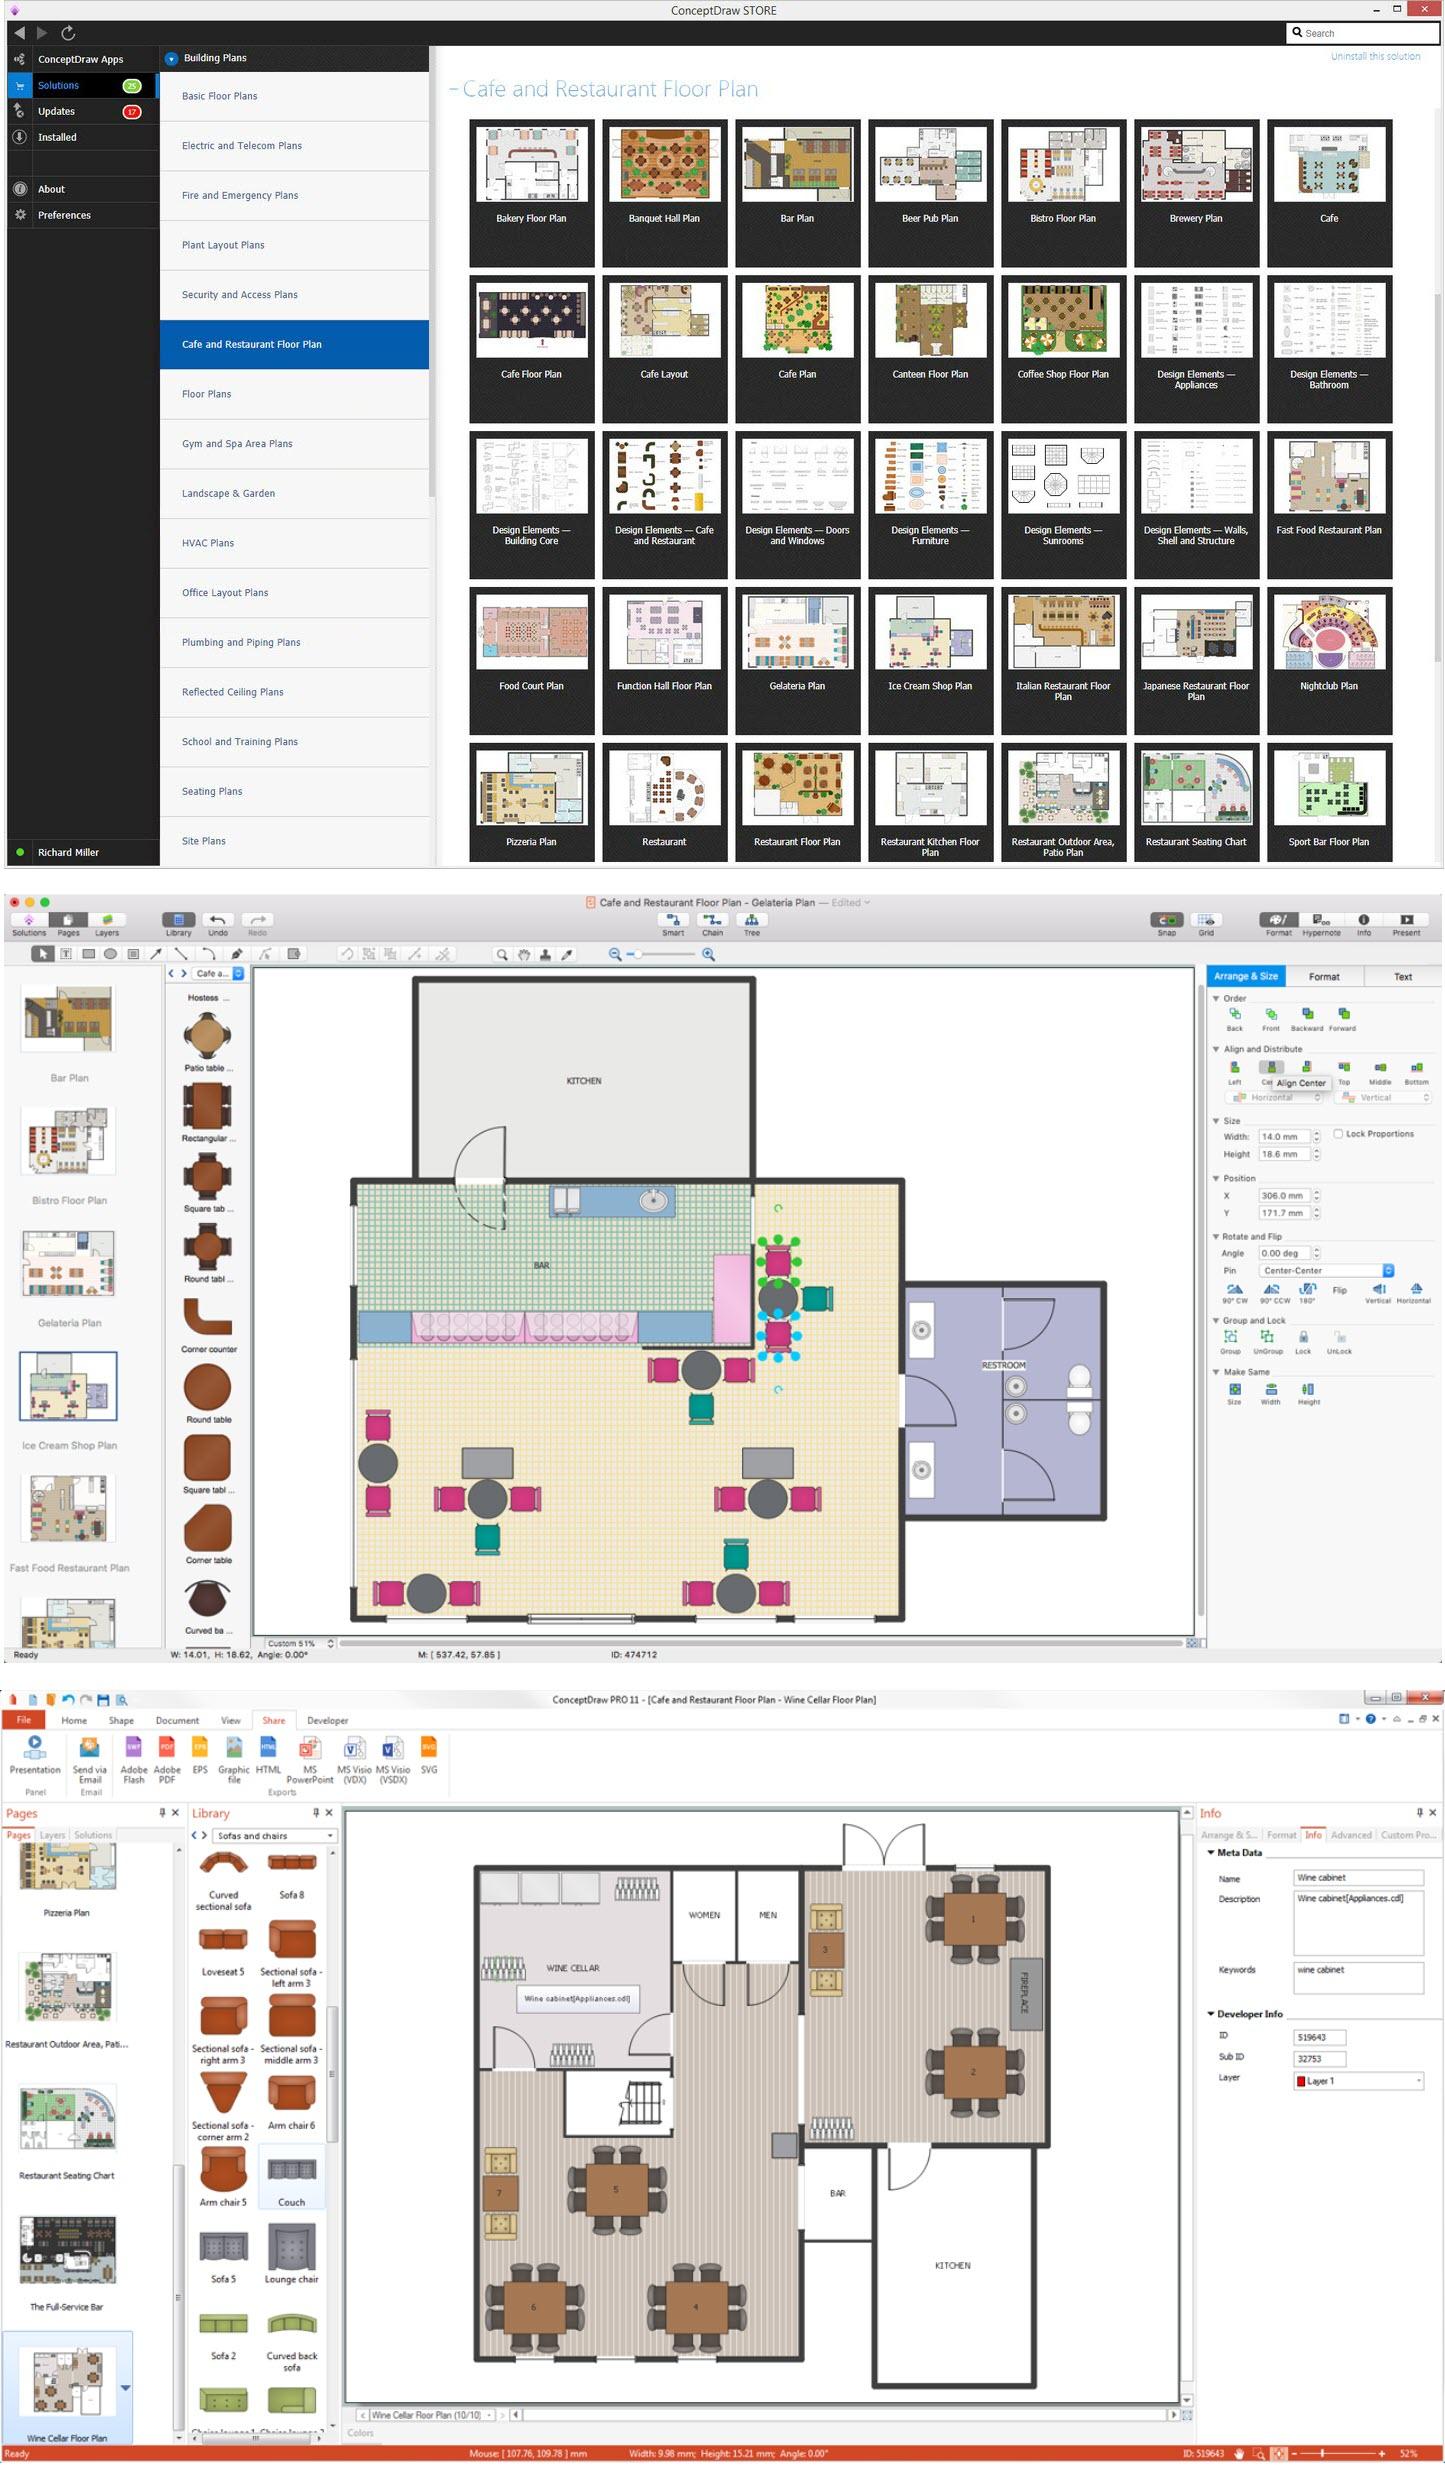 Cafe And Restaurant Floor Plans Restaurant Floor Plans Samples Coffee Shop Floor Plan Examples Of Small Coffee Shop Floor Plans